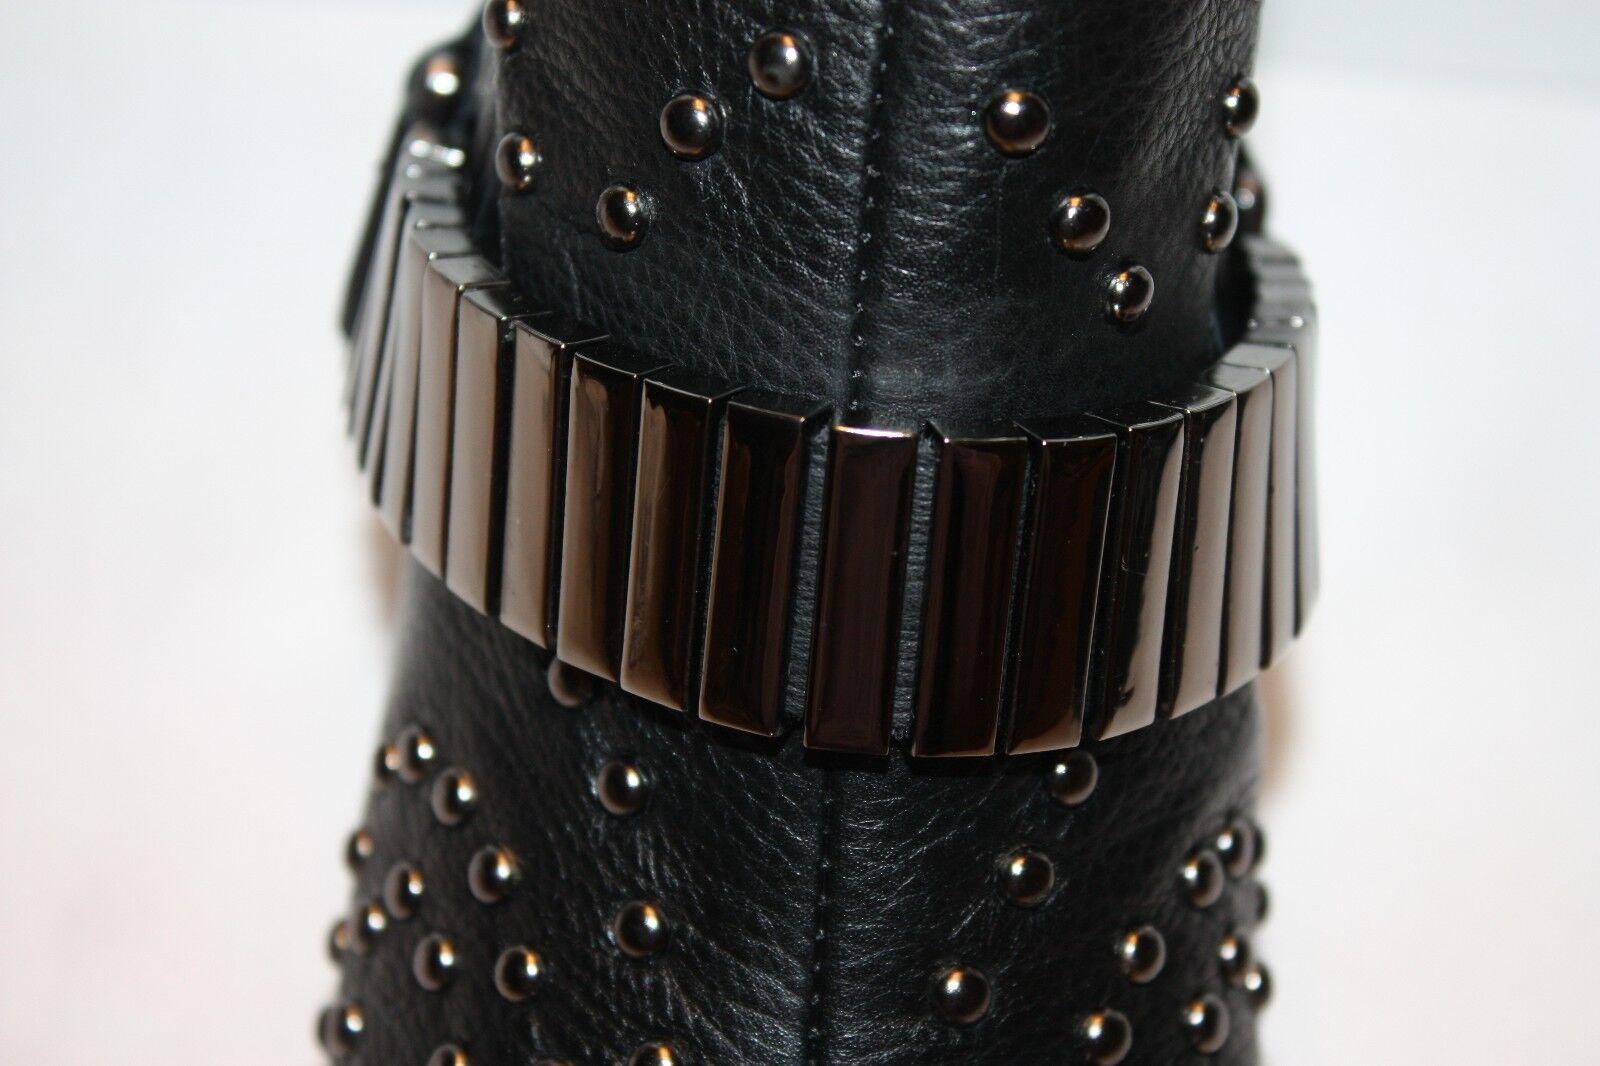 NEW NEW NEW  NIB SCHUTZ Black Napa Preto Leather Stud ANJA Moto Biker Ankle Boots 6  330 358e0e